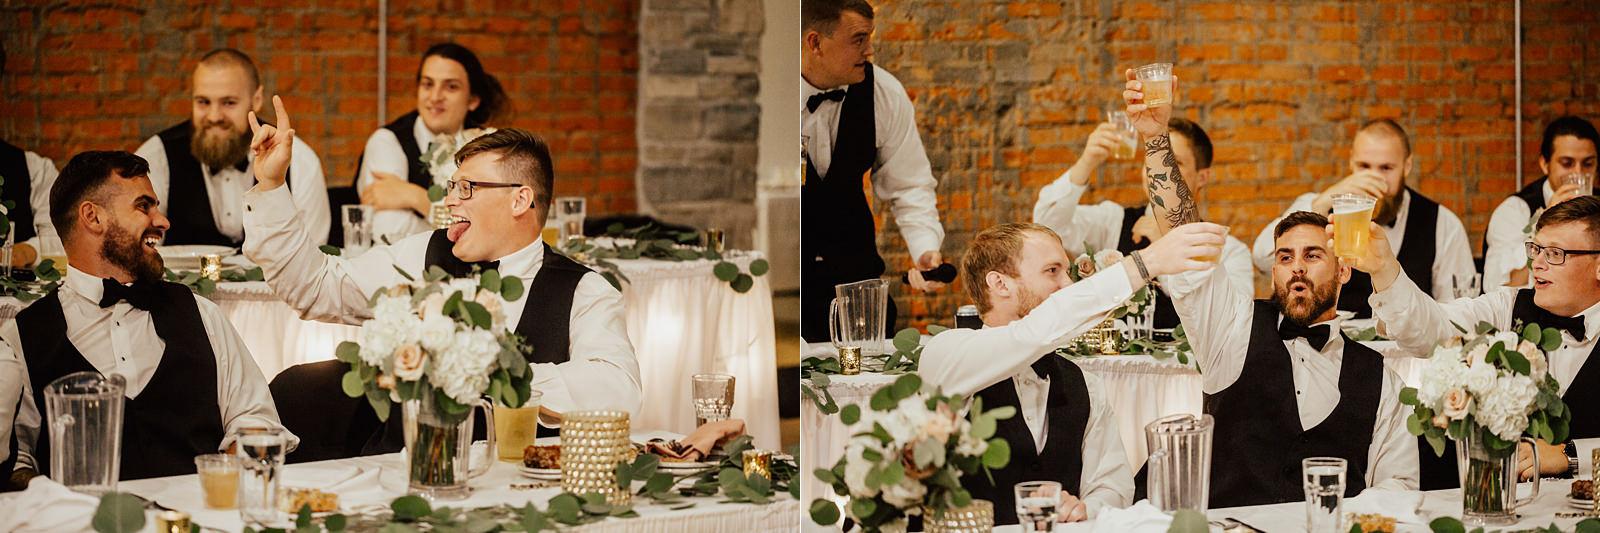 Molly & Bradley Modern Boho Wedding at The University Club Quad Cities-47.jpg